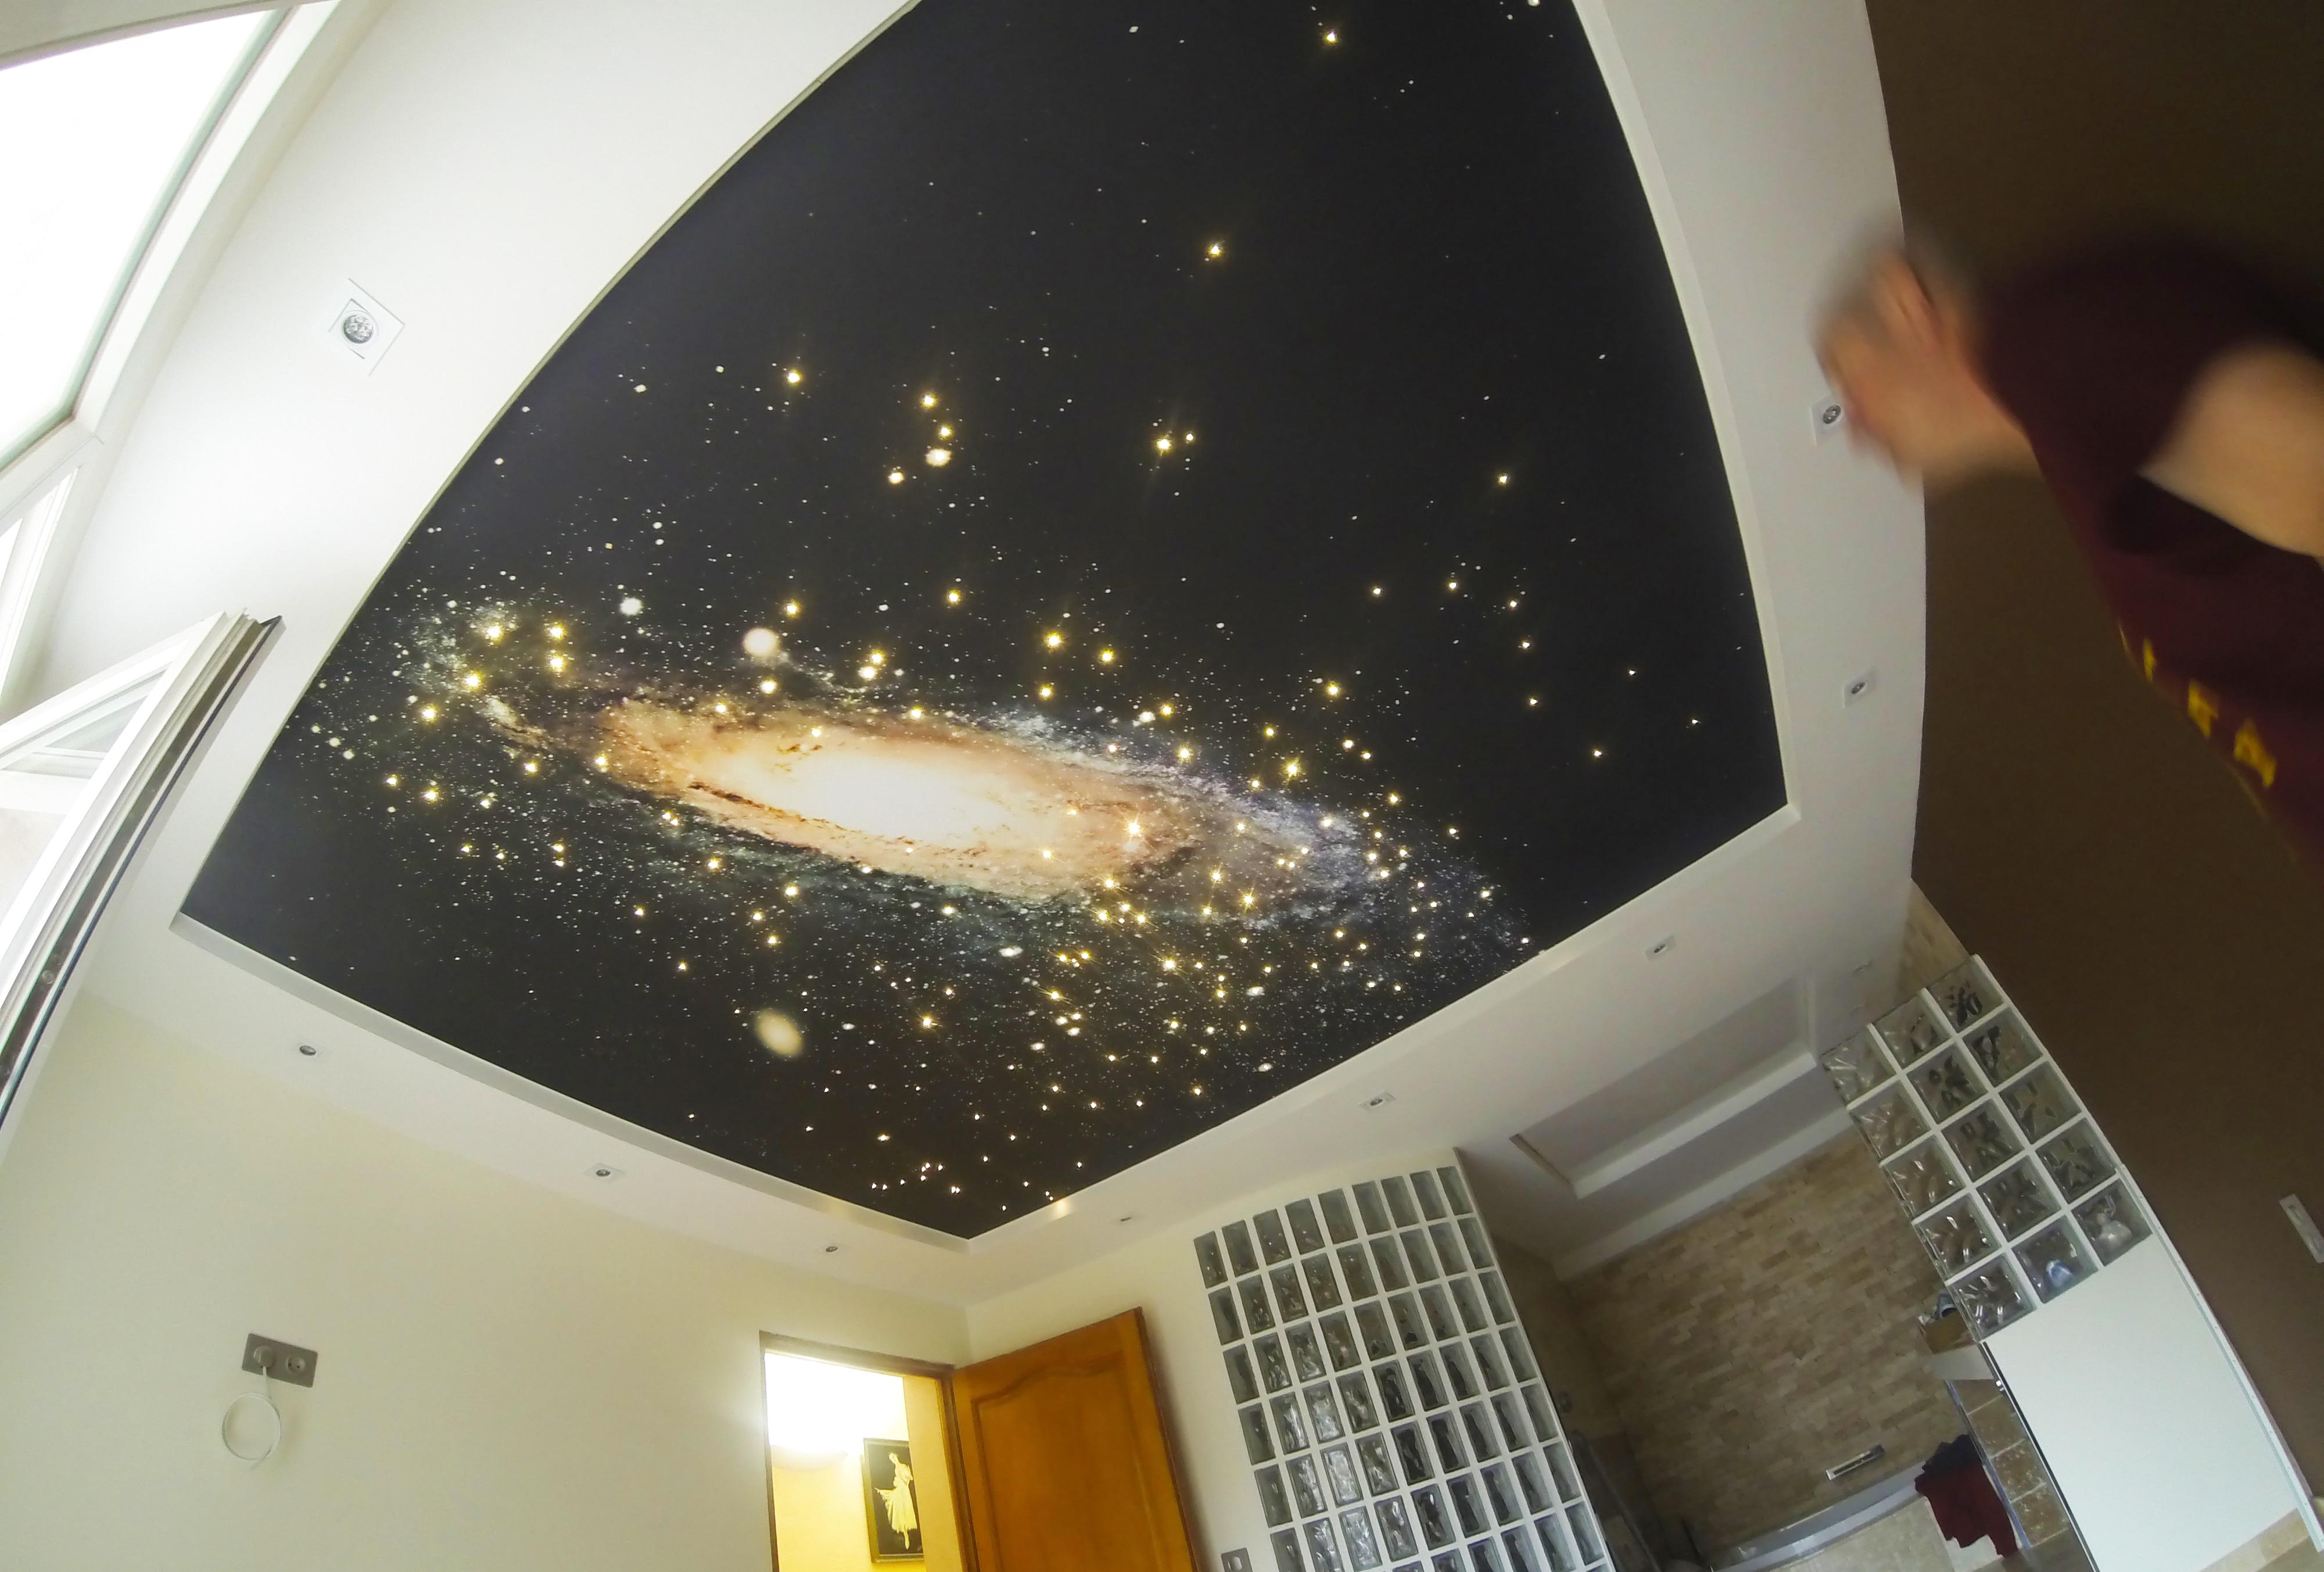 Ciel étoilé sur plafond tendu imprimé.